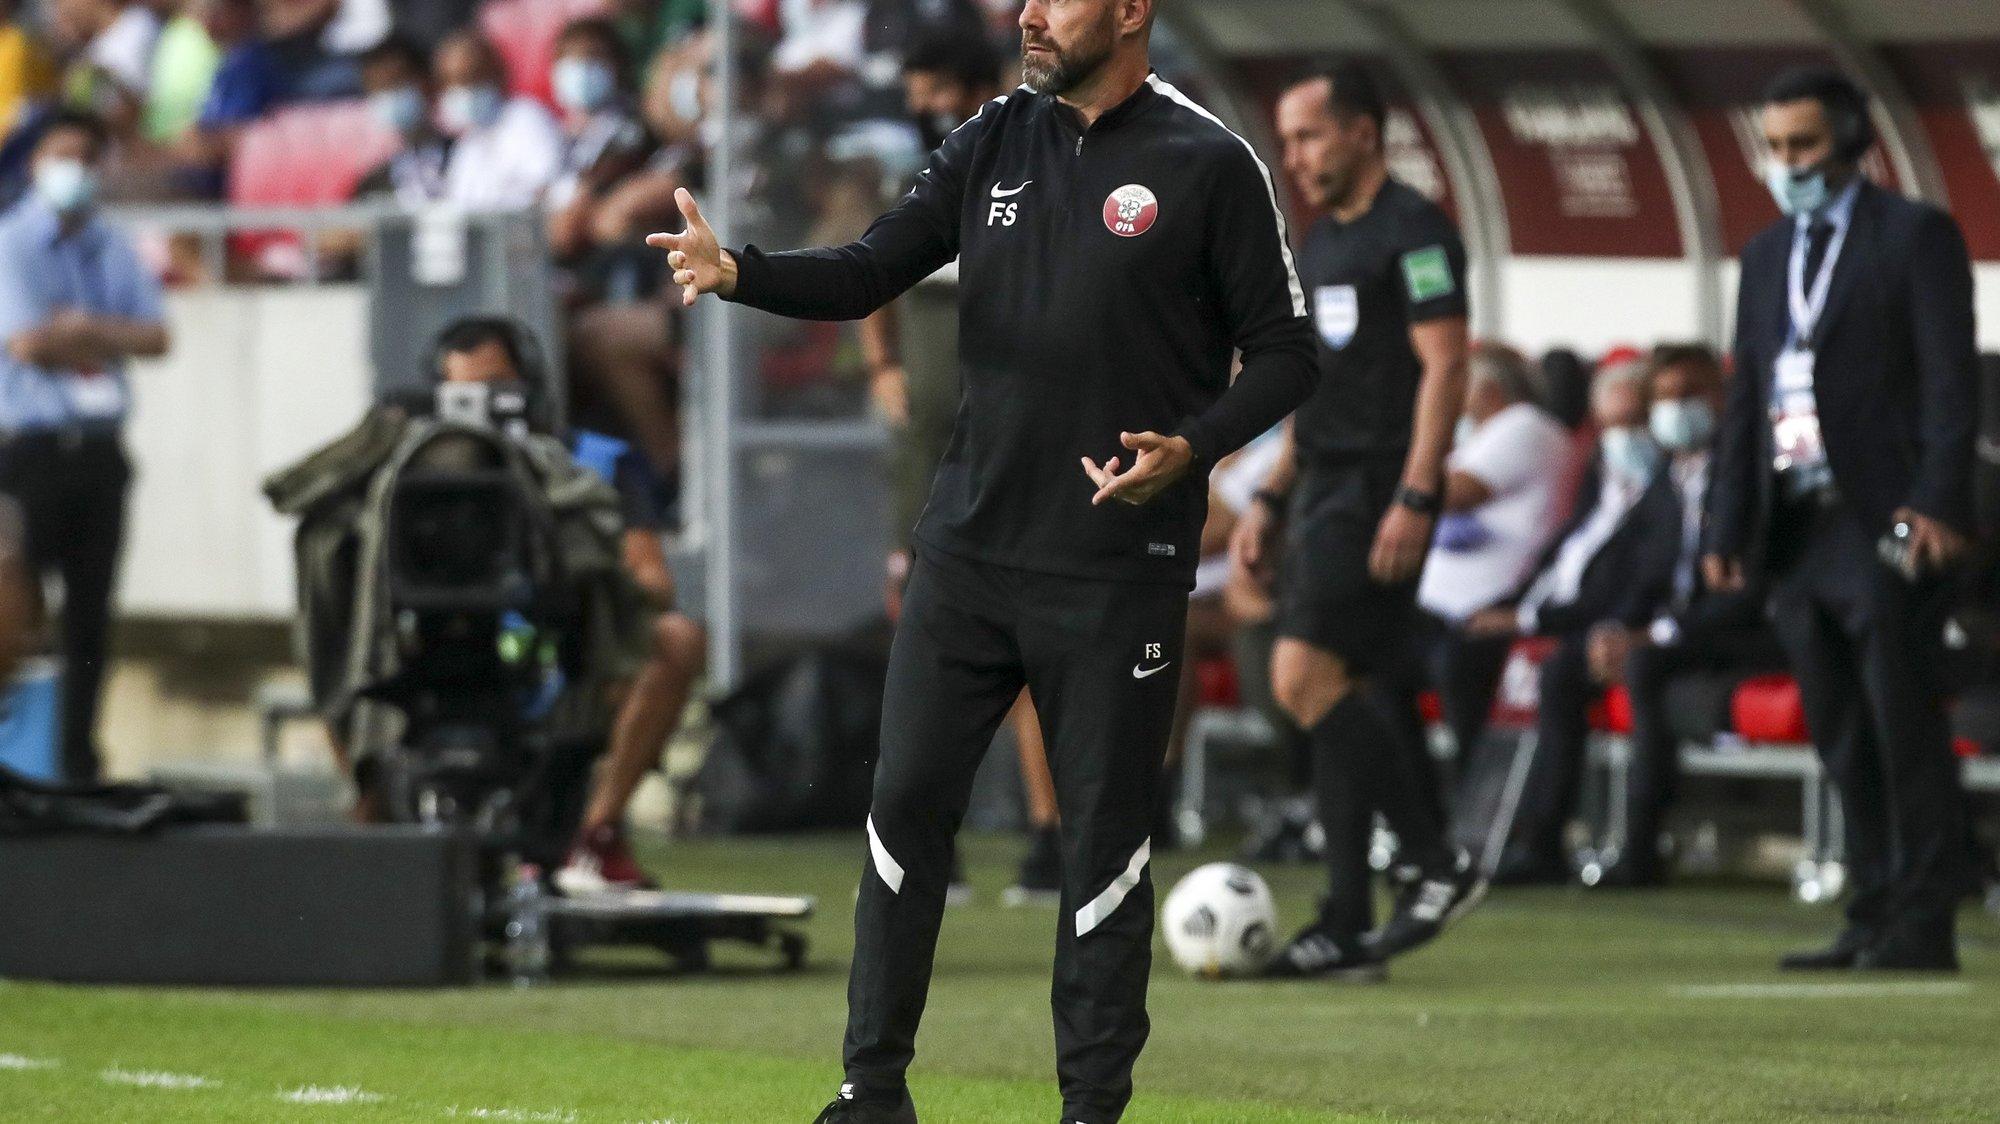 Qatar's head coach Felix Sanchez reacts during the friendly soccer match between Qatar and Portugal held at Nagyerdei stadium in Debrecen, Hungary, 04 September 2021. PAULO NOVAIS/LUSA